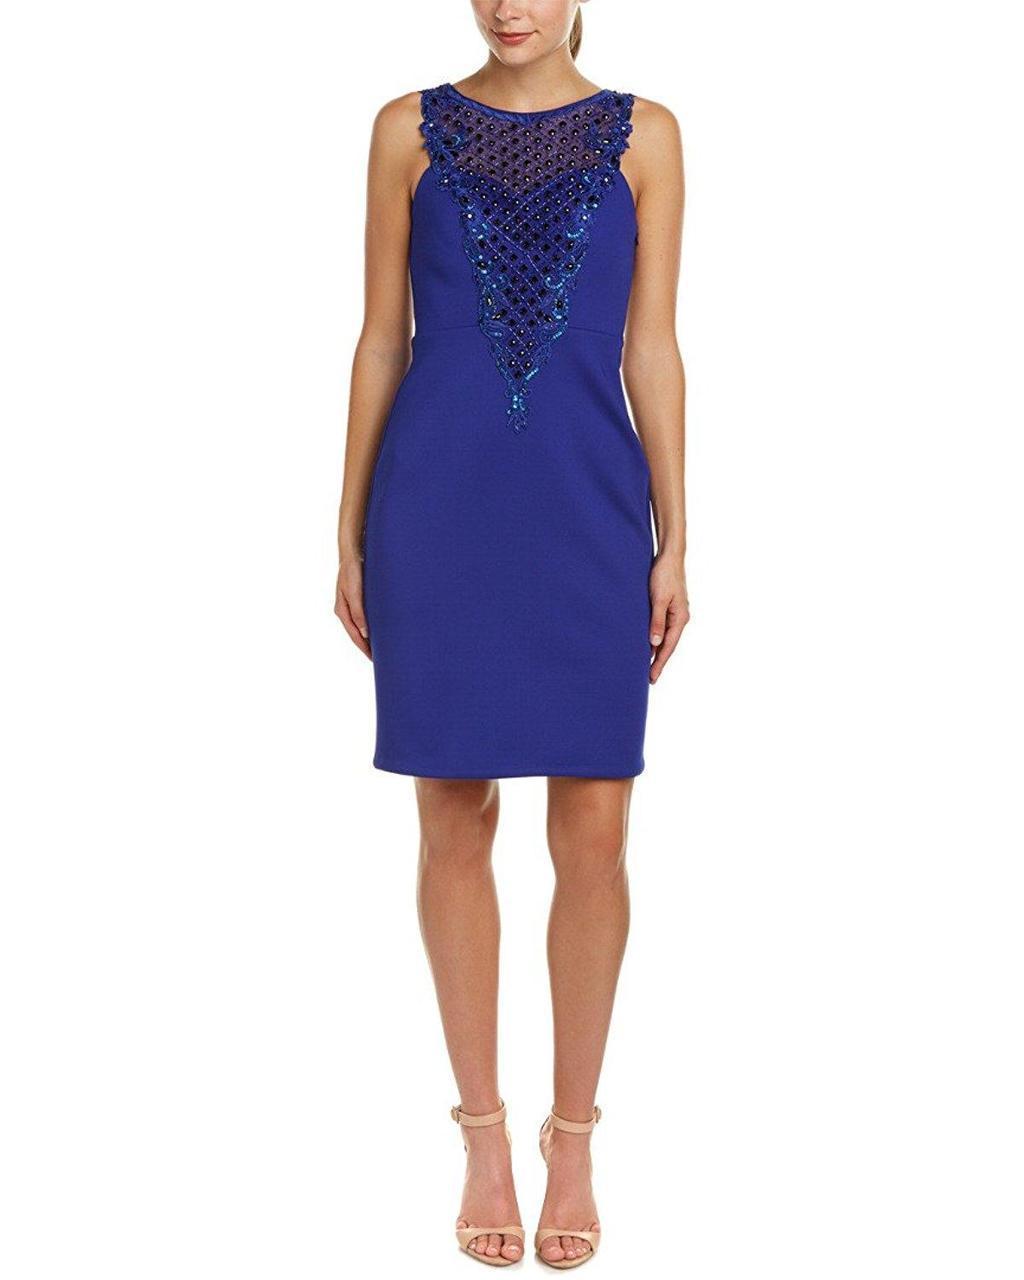 Sue Wong - Embroidered Illusion Bateau Dress N5345NM